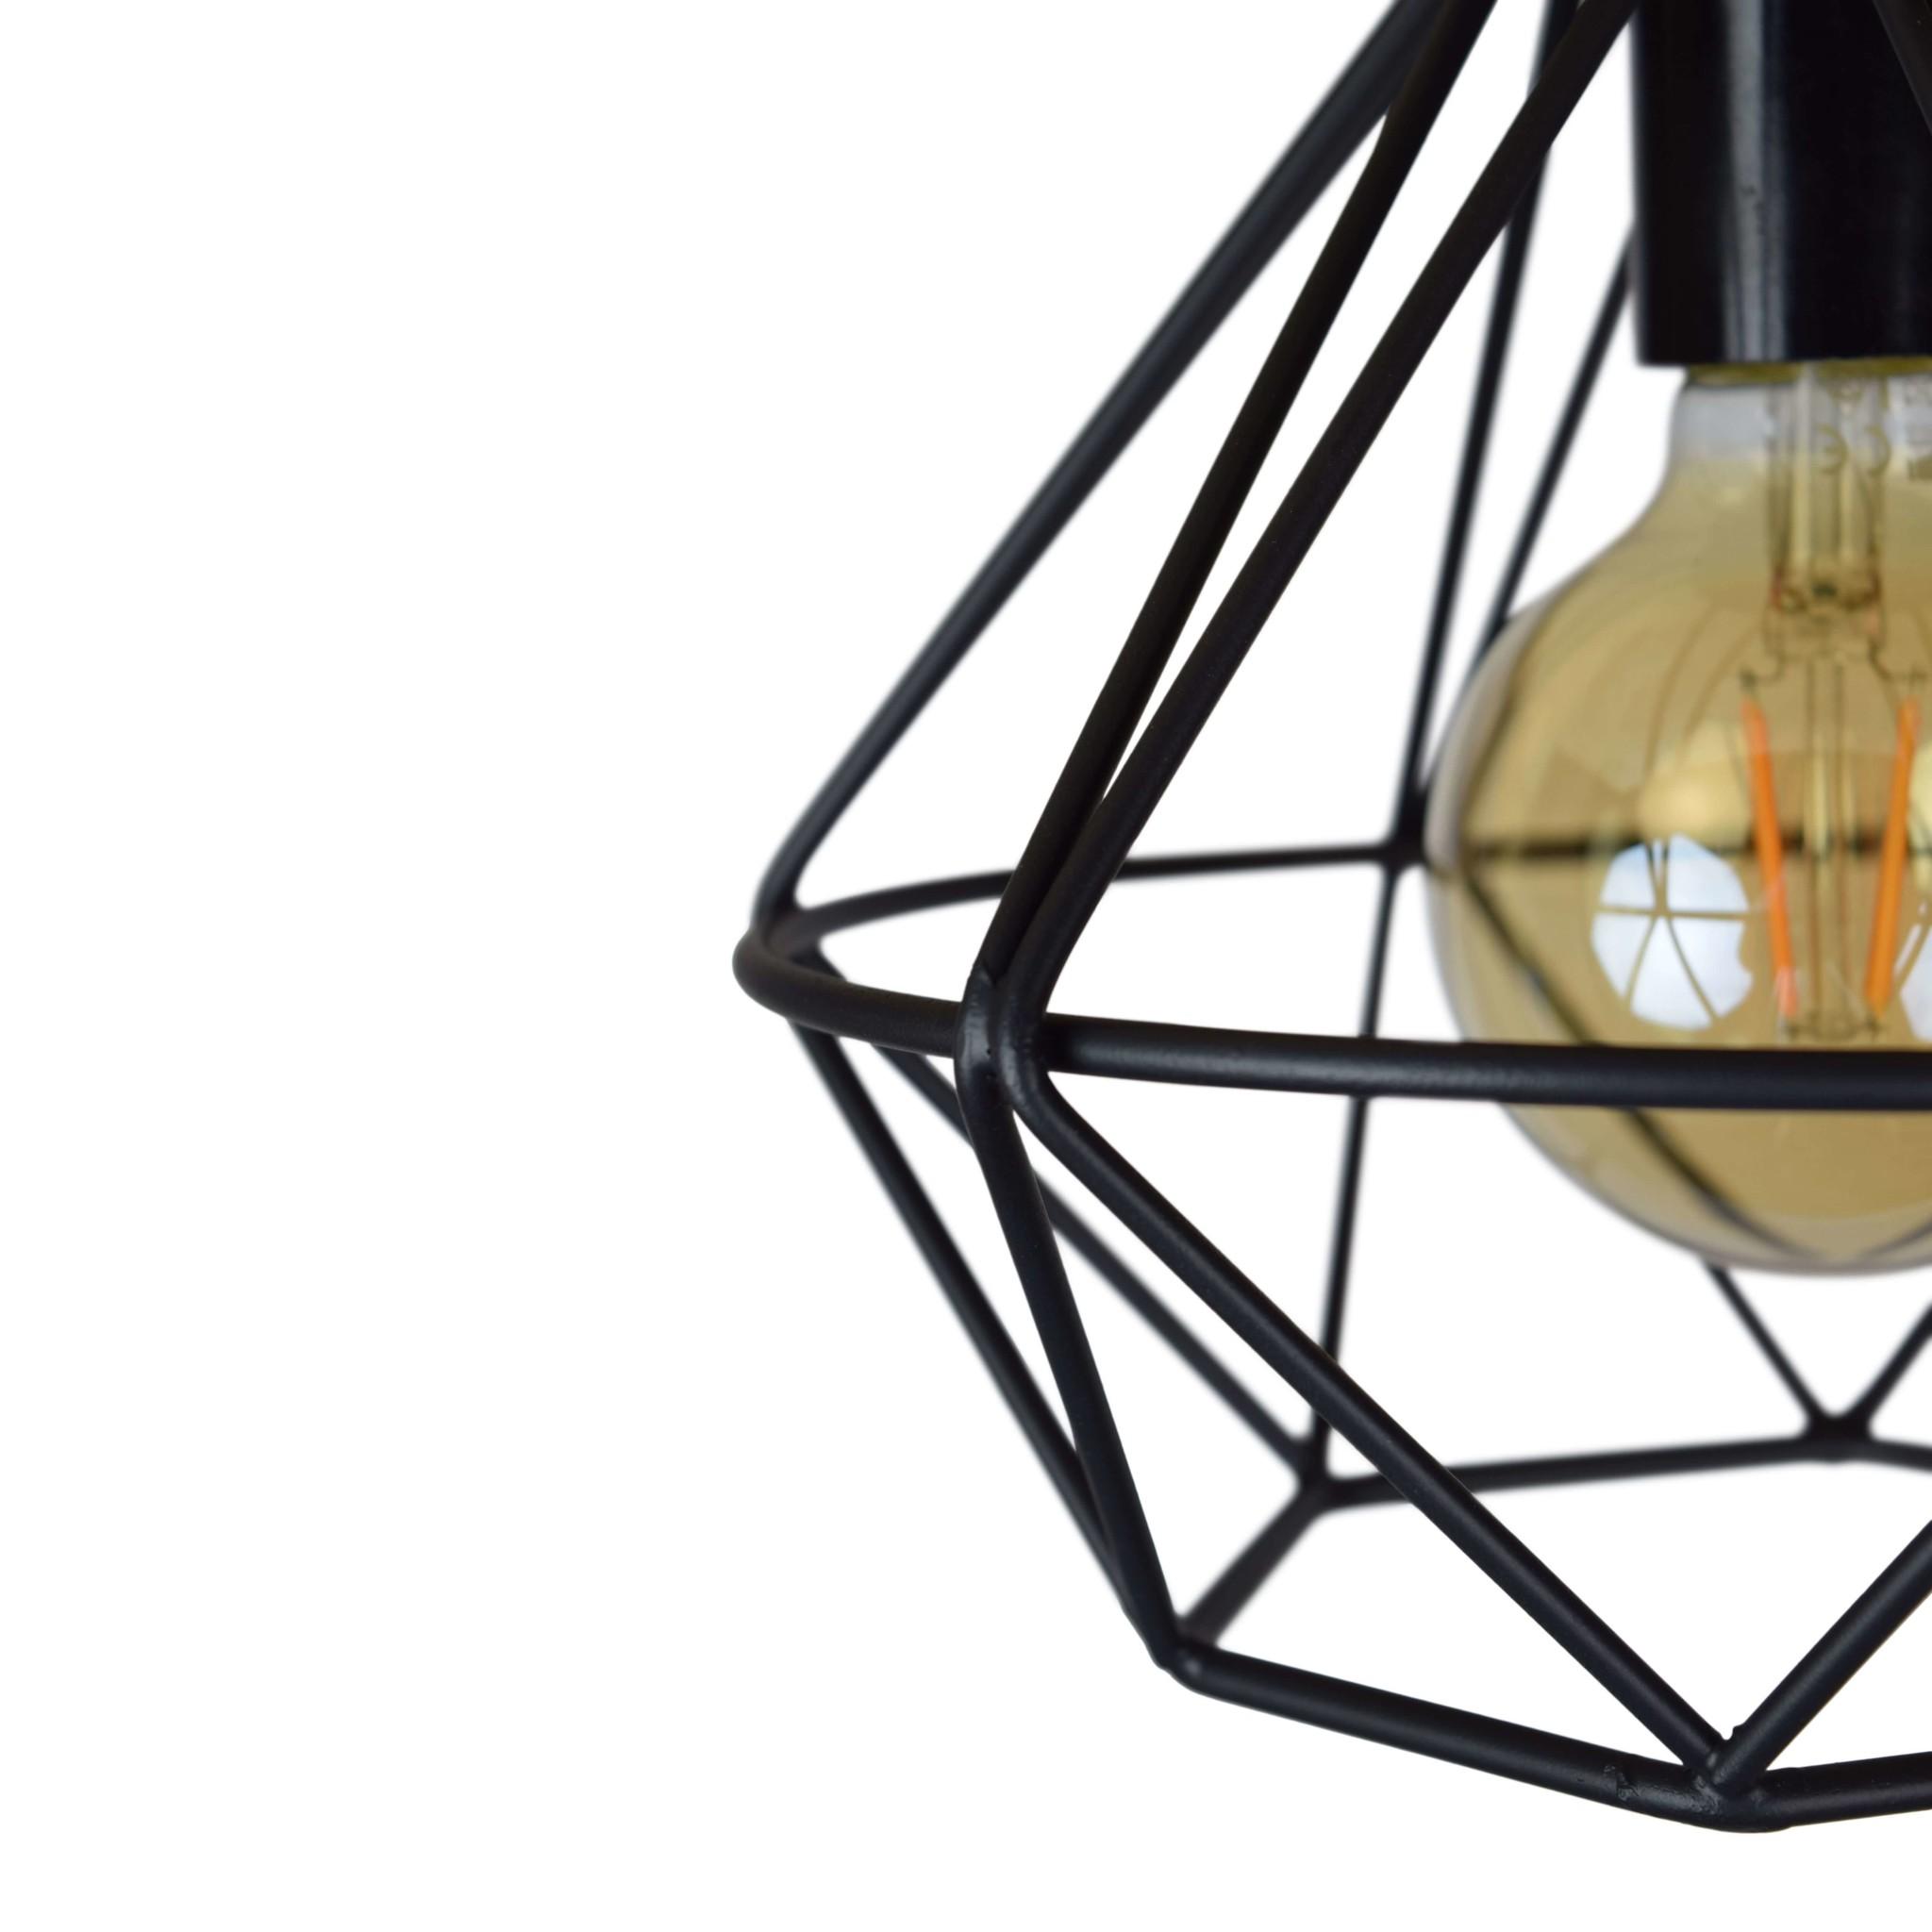 Urban Interiors plafondlamp Wire - zwart metaal - ø 22 cm-ai-cl-2111-8719325171211